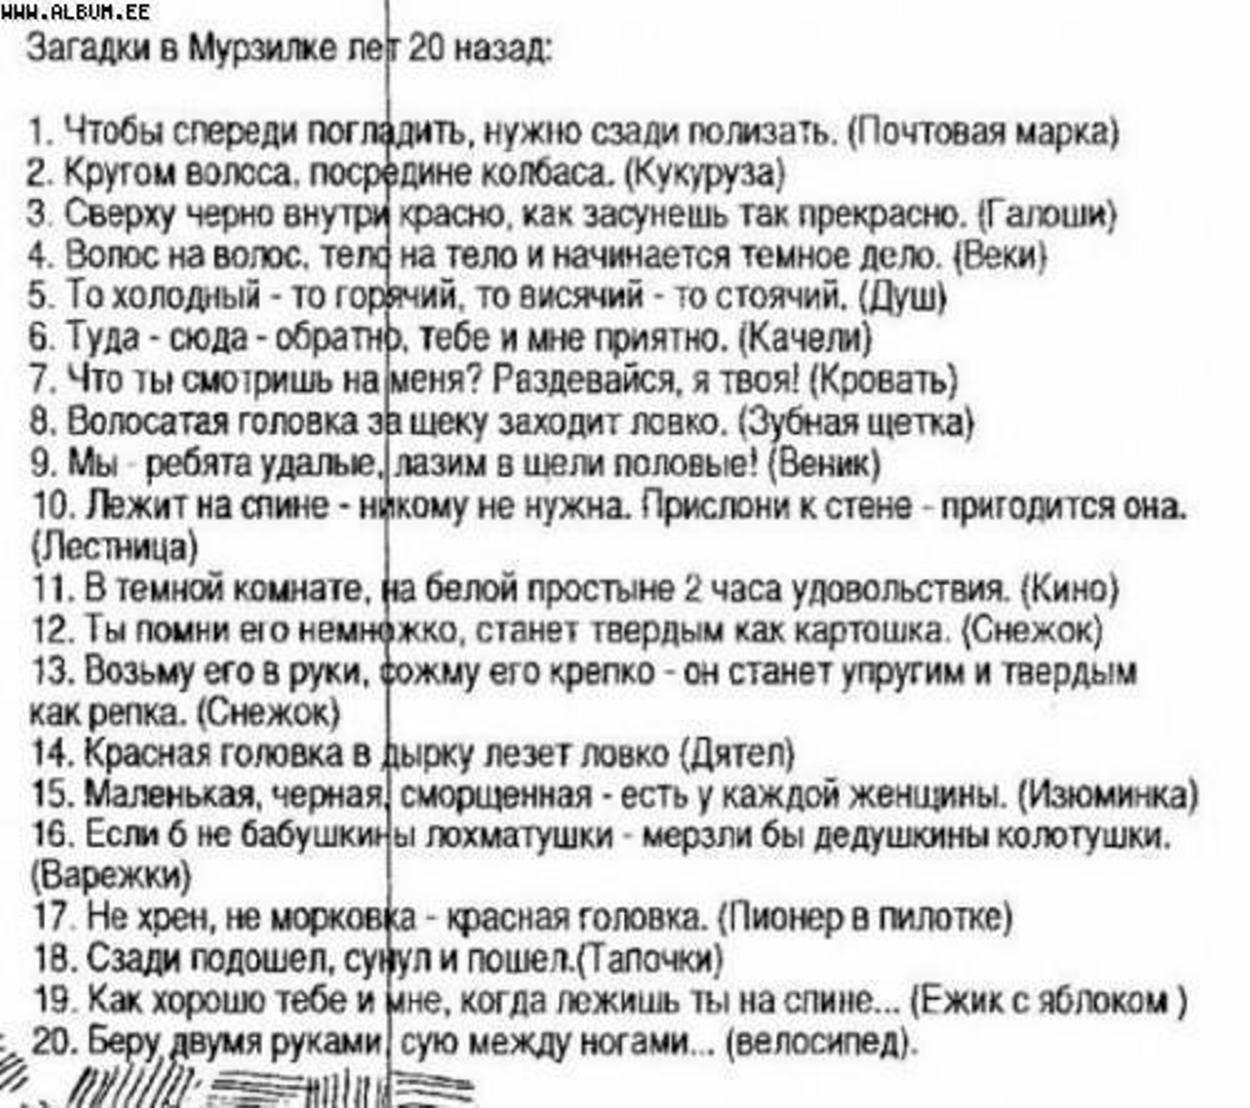 http://i2.imageban.ru/out/2014/03/22/84d1ae98bb4523147d969a2d88368d3f.jpg